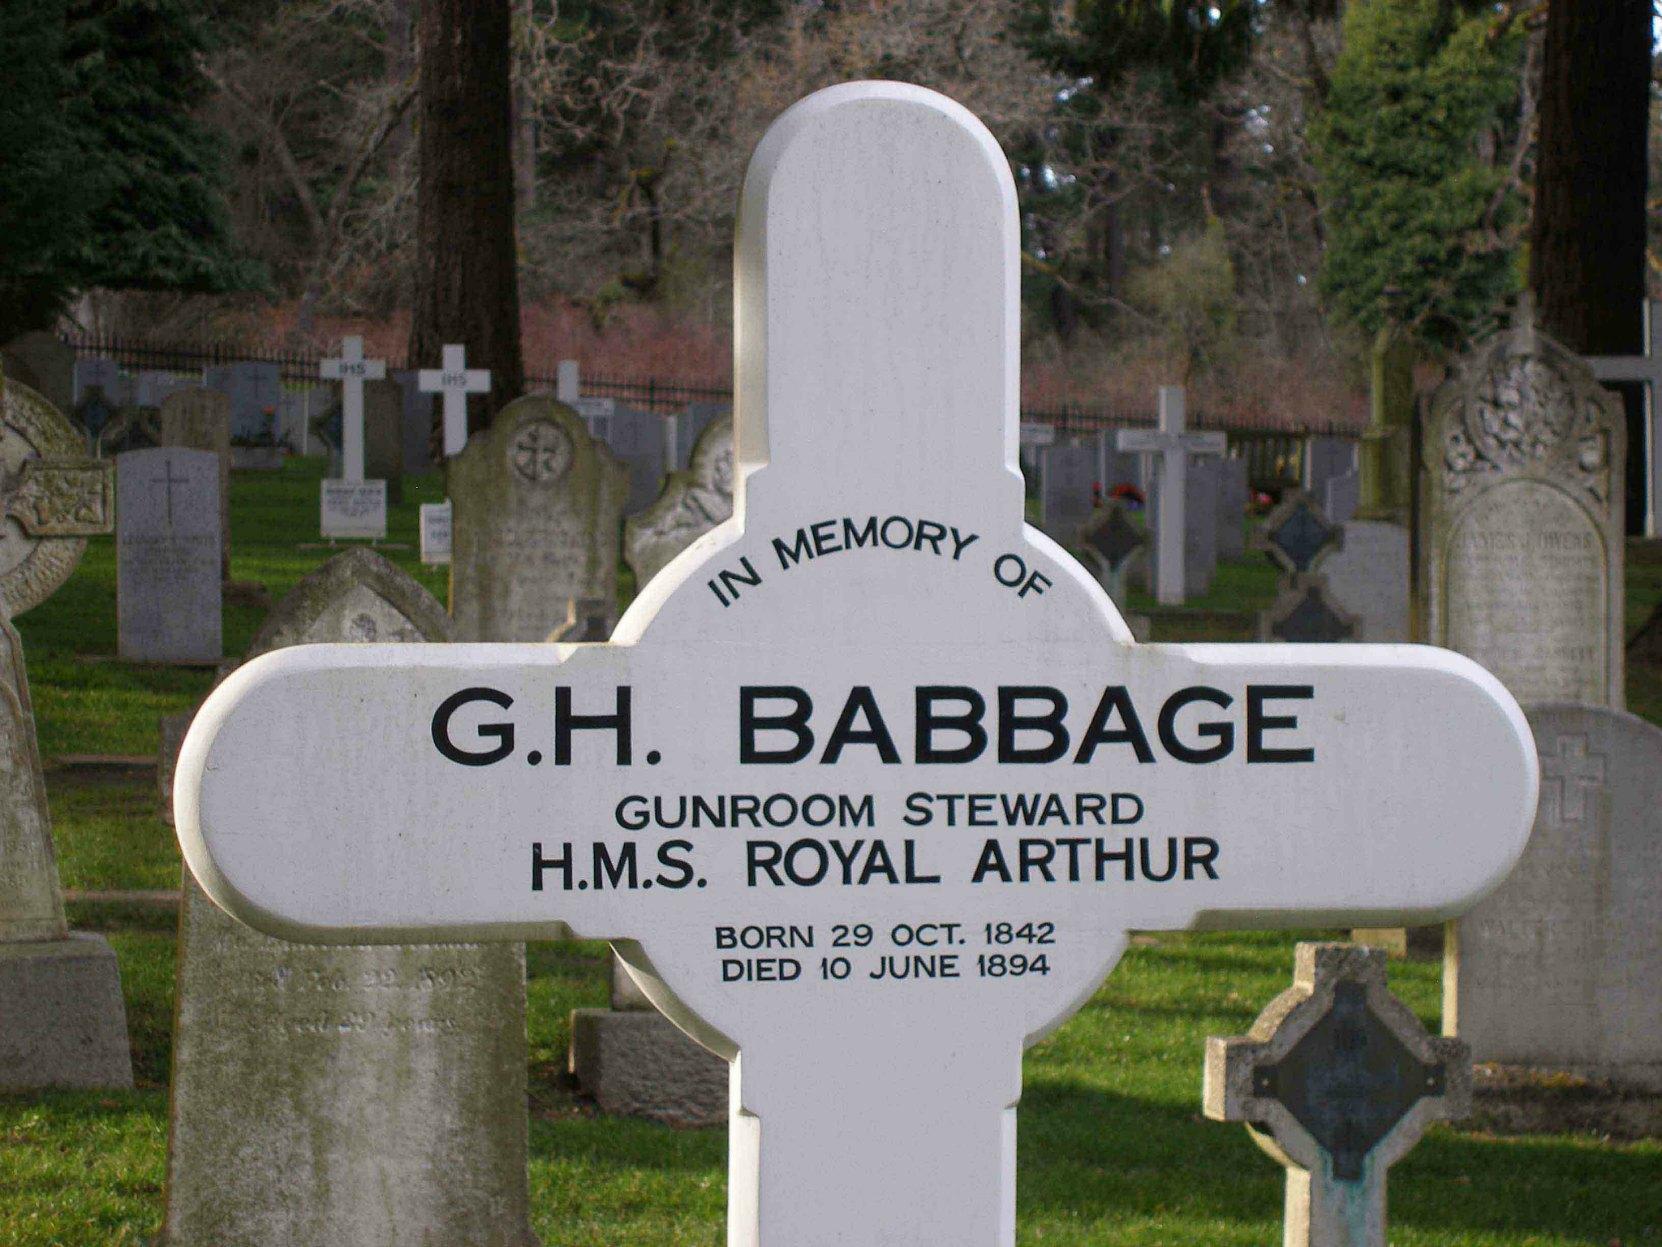 George Henry Babbage, grave marker inscription, Naval & Veterans Cemetery, Esquimalt, B.C.